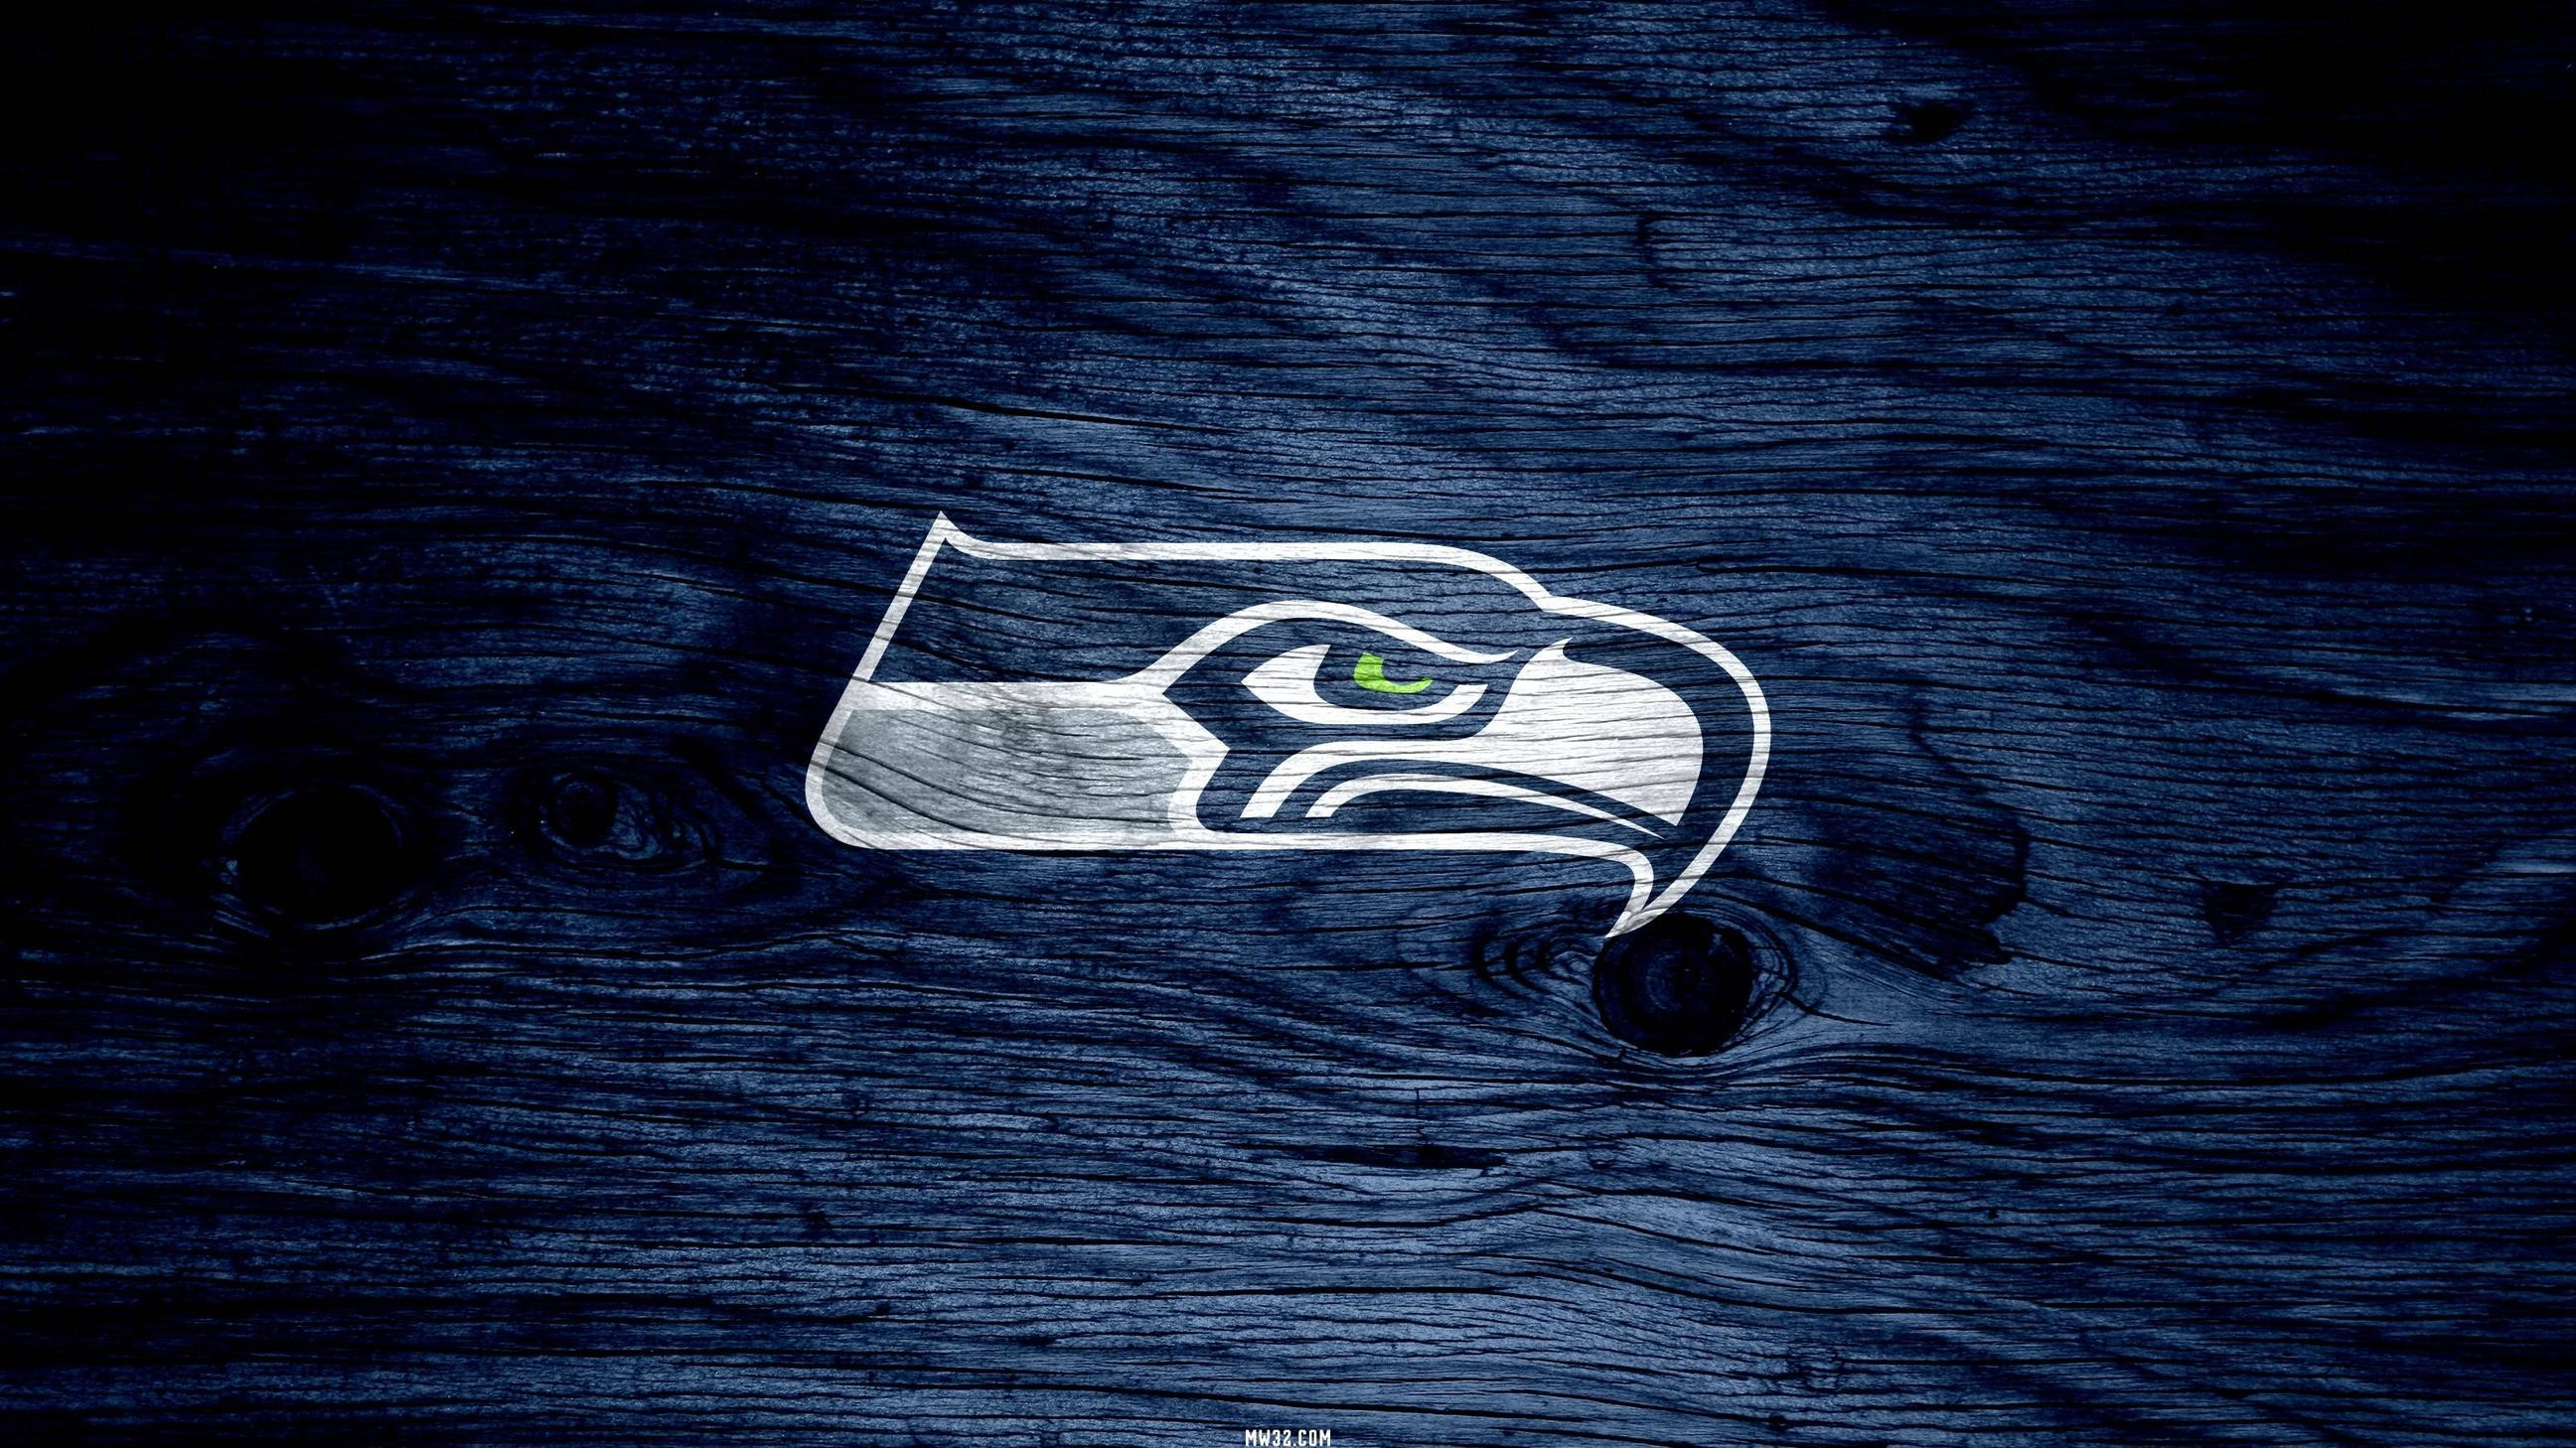 Seahawks Wallpaper Screensavers